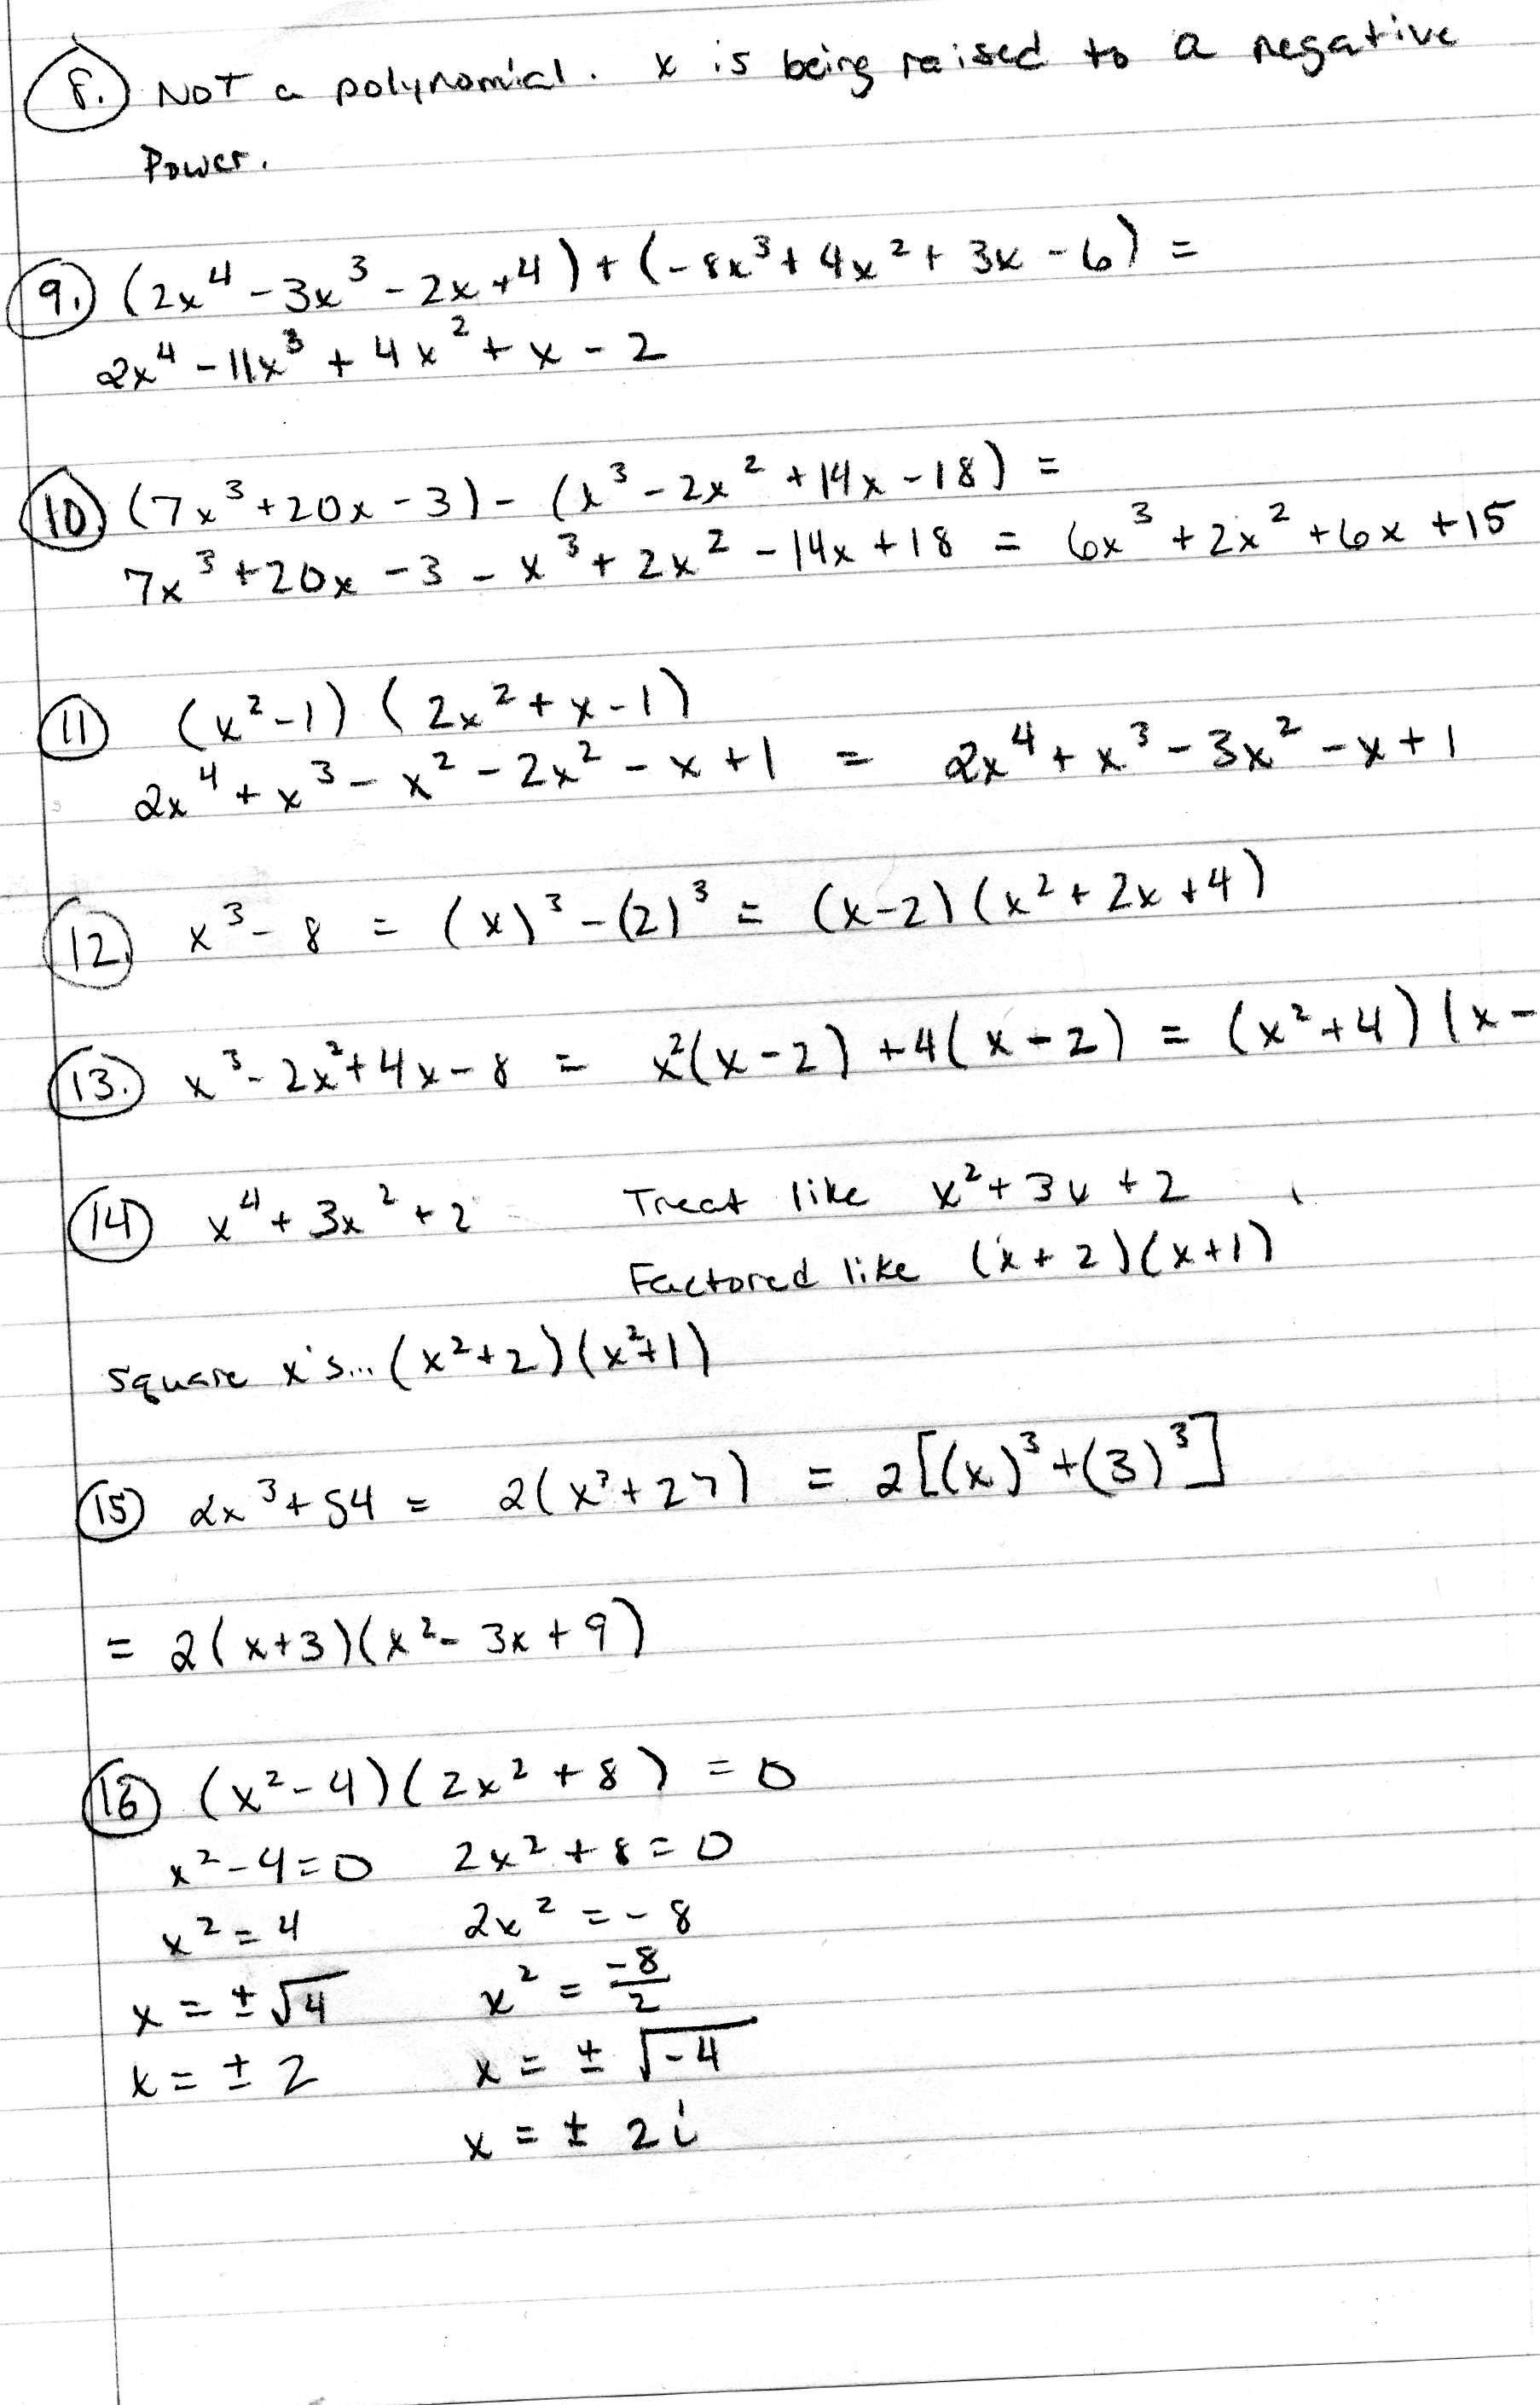 Algebra 2 PDFs Mr Deibels Class – Algebra 2 Worksheets with Answer Key